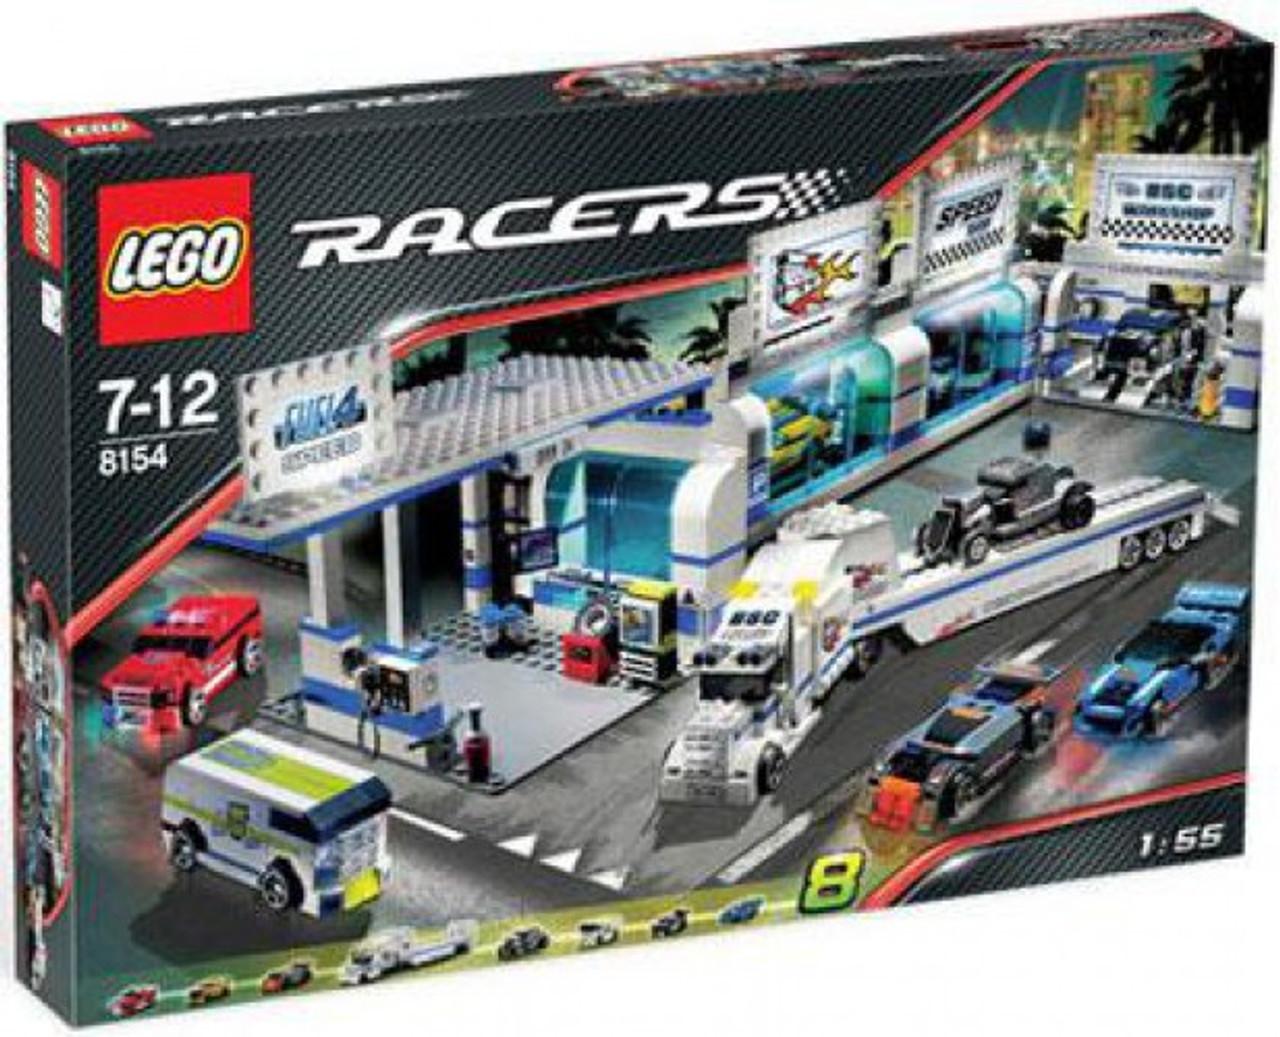 LEGO Racers Brick Street Customs Set #8154